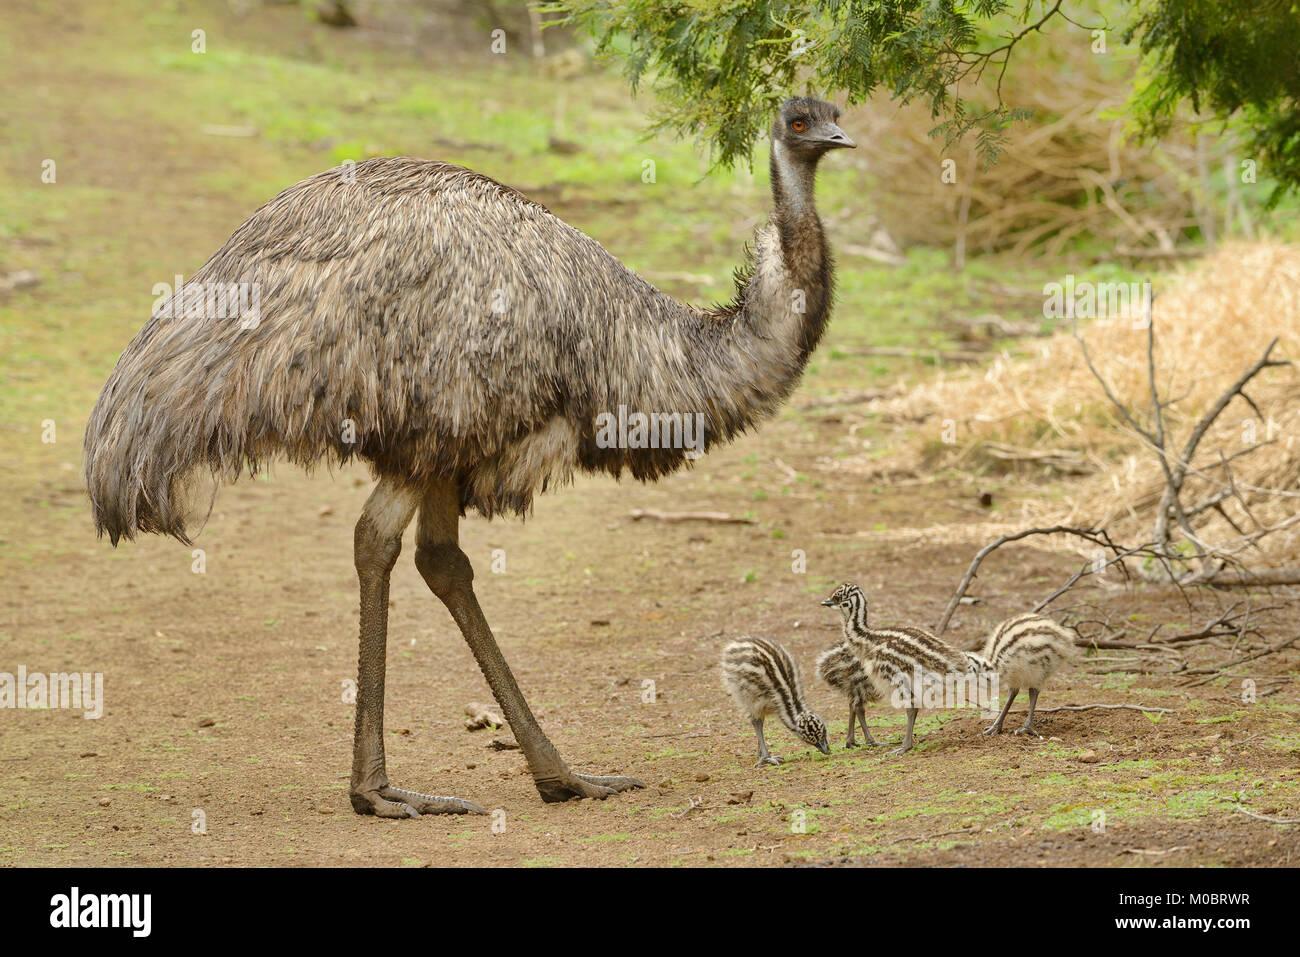 Emu Dromaius novaehollandiae Male with chicks Photographed in Victoria, Australia Stock Photo